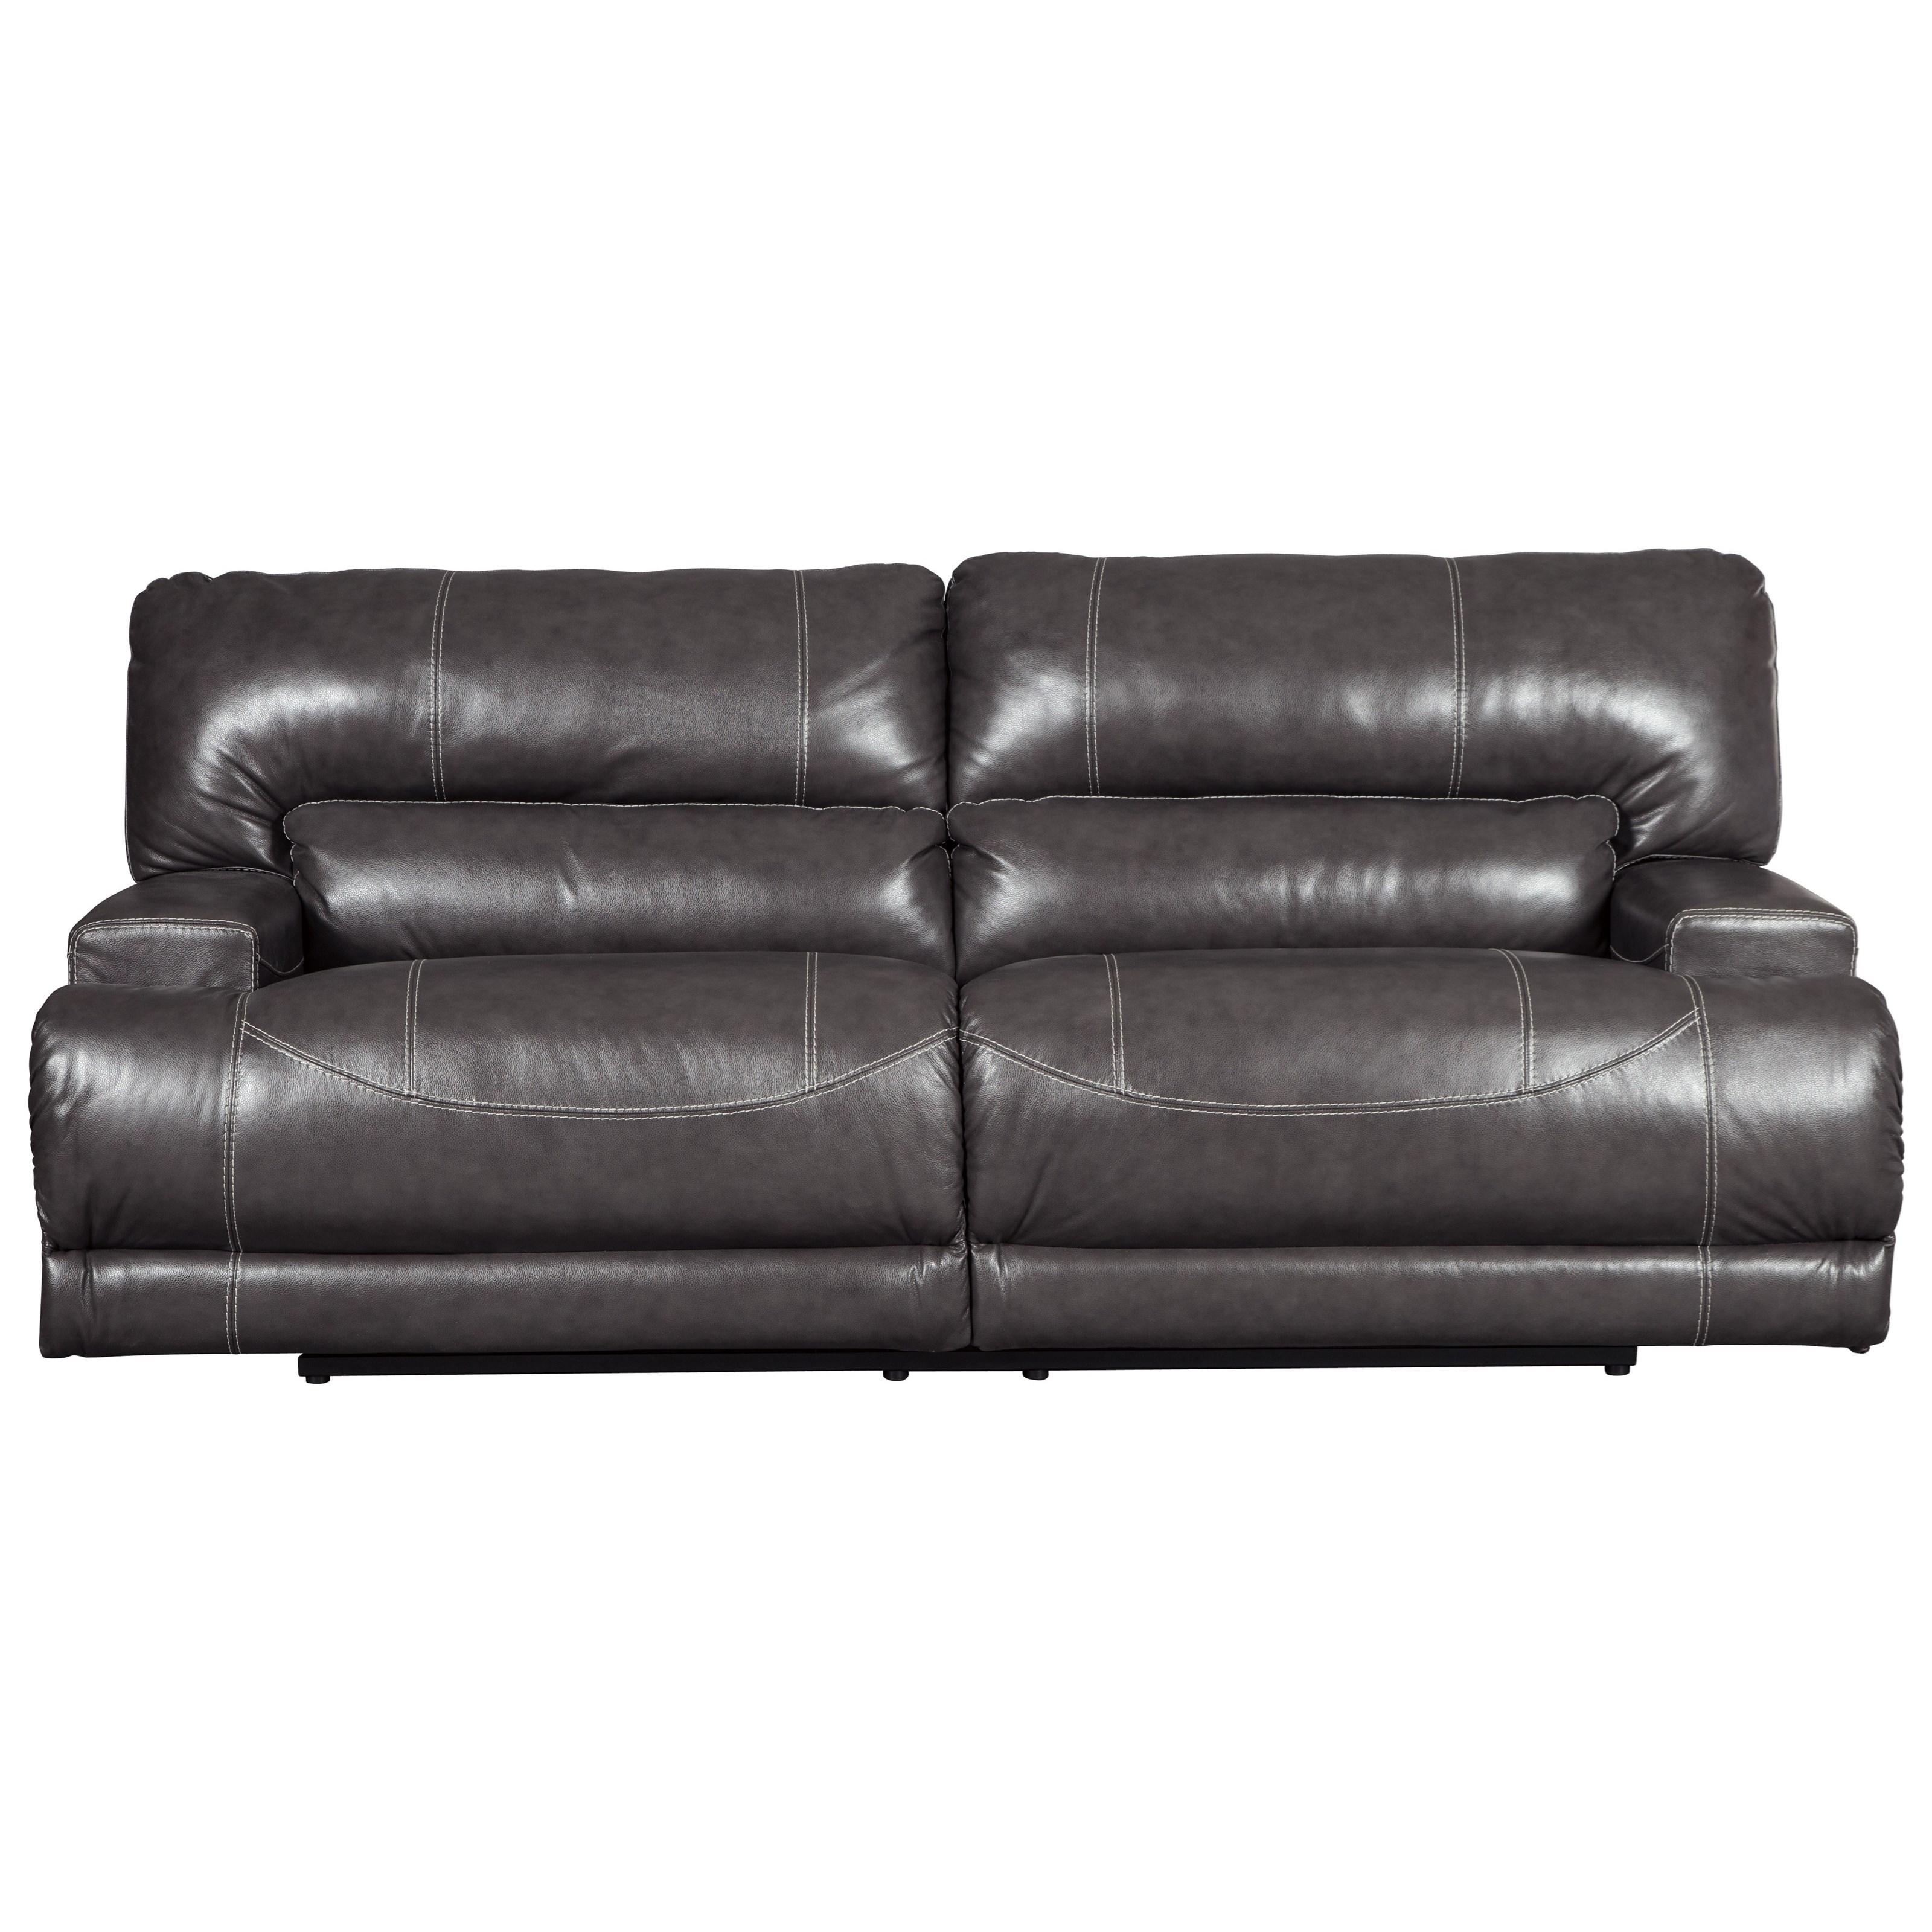 McCaskill 2-Seat Reclining Sofa by Ashley (Signature Design) at Johnny Janosik